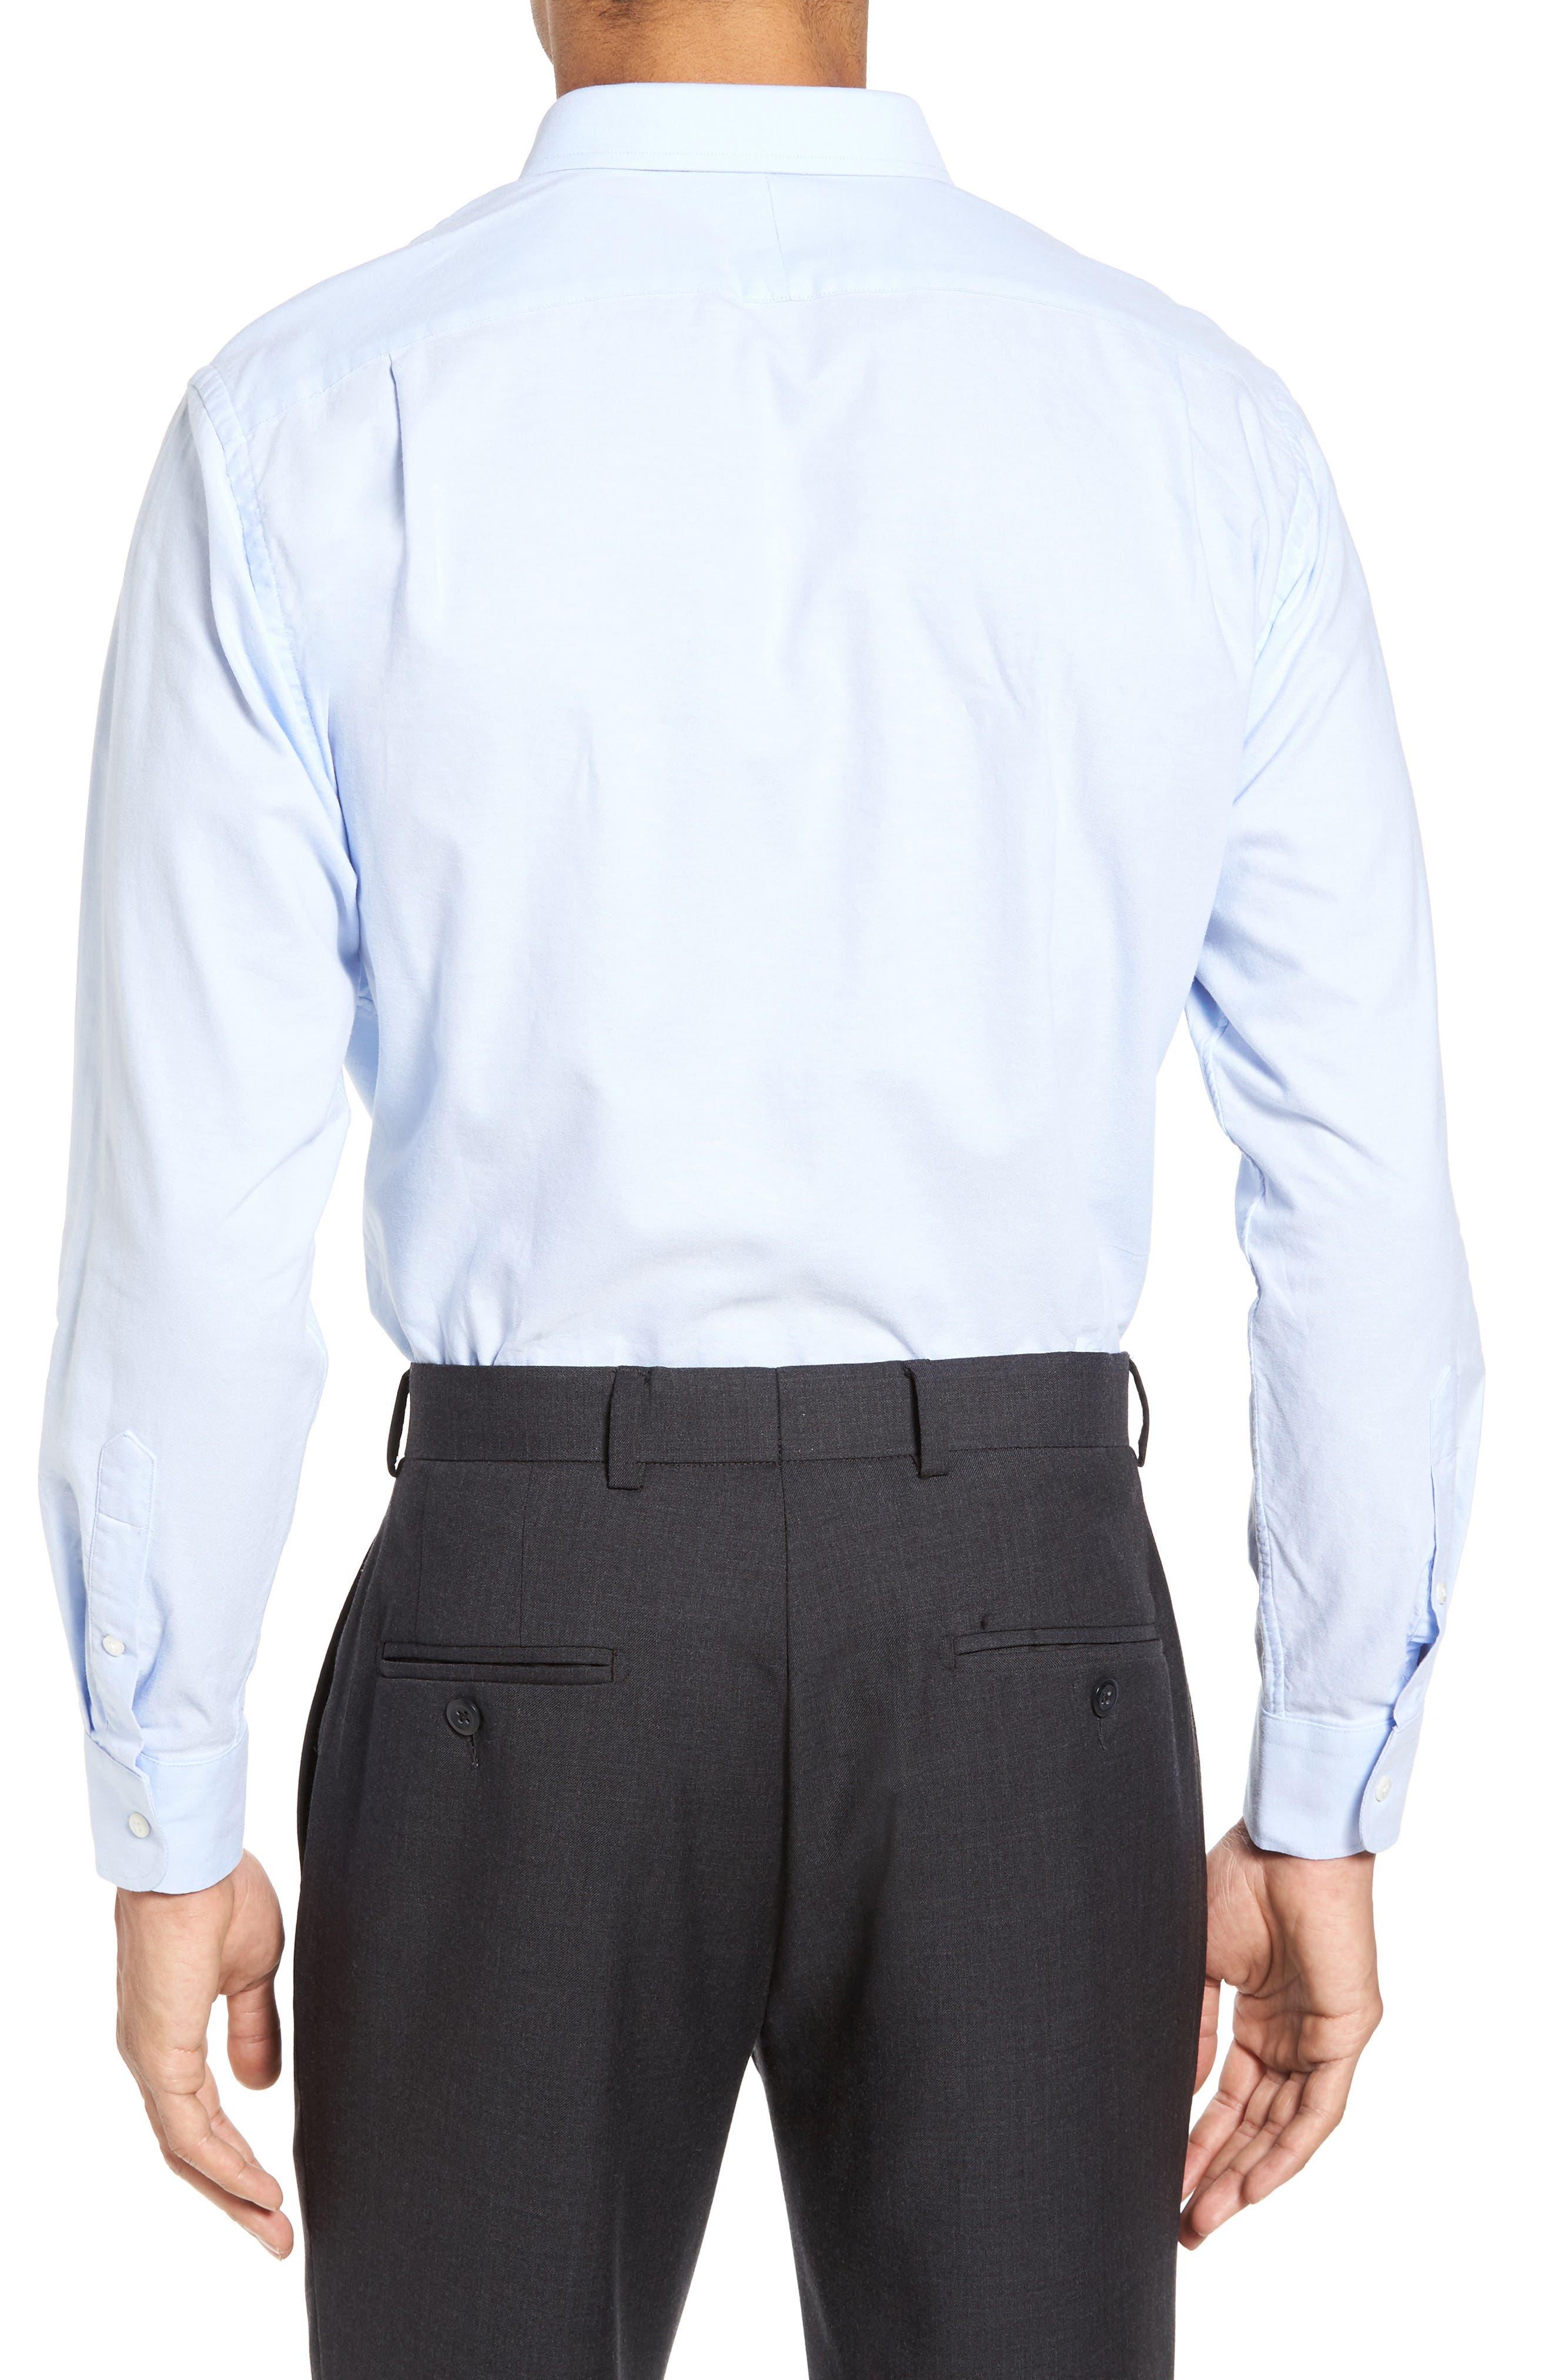 Trim Fit Solid Oxford Dress Shirt,                             Alternate thumbnail 7, color,